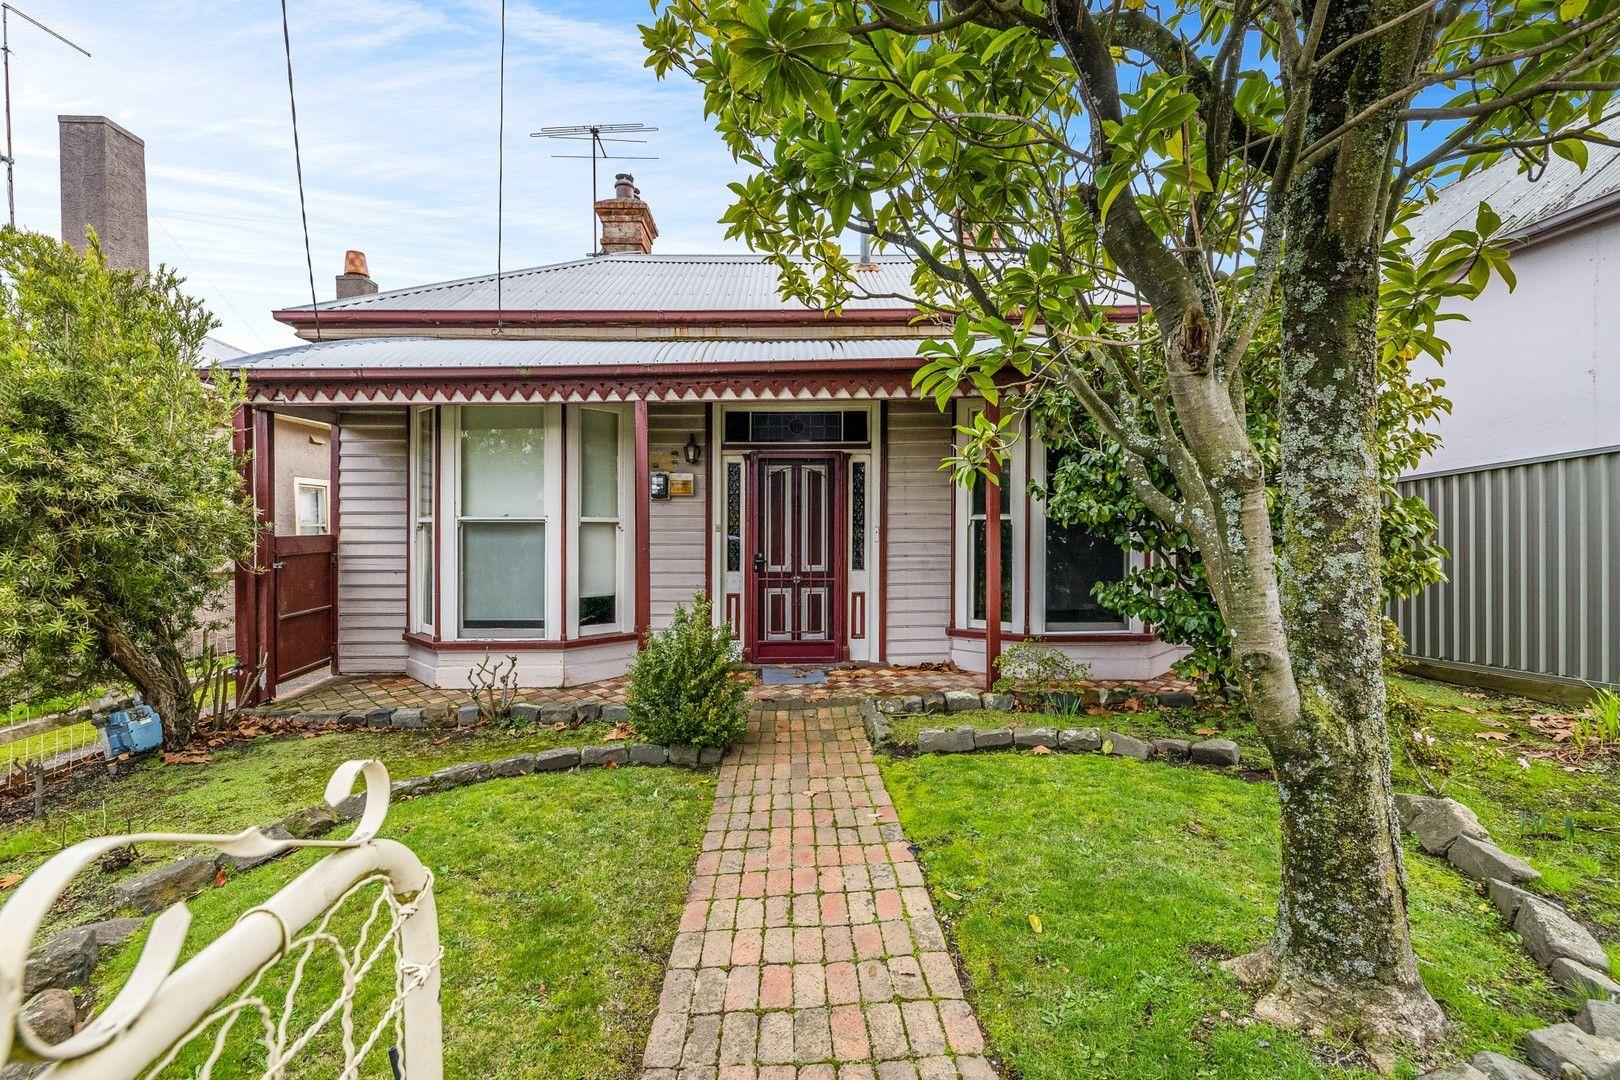 12 Drummond Street South, Ballarat Central VIC 3350, Image 0